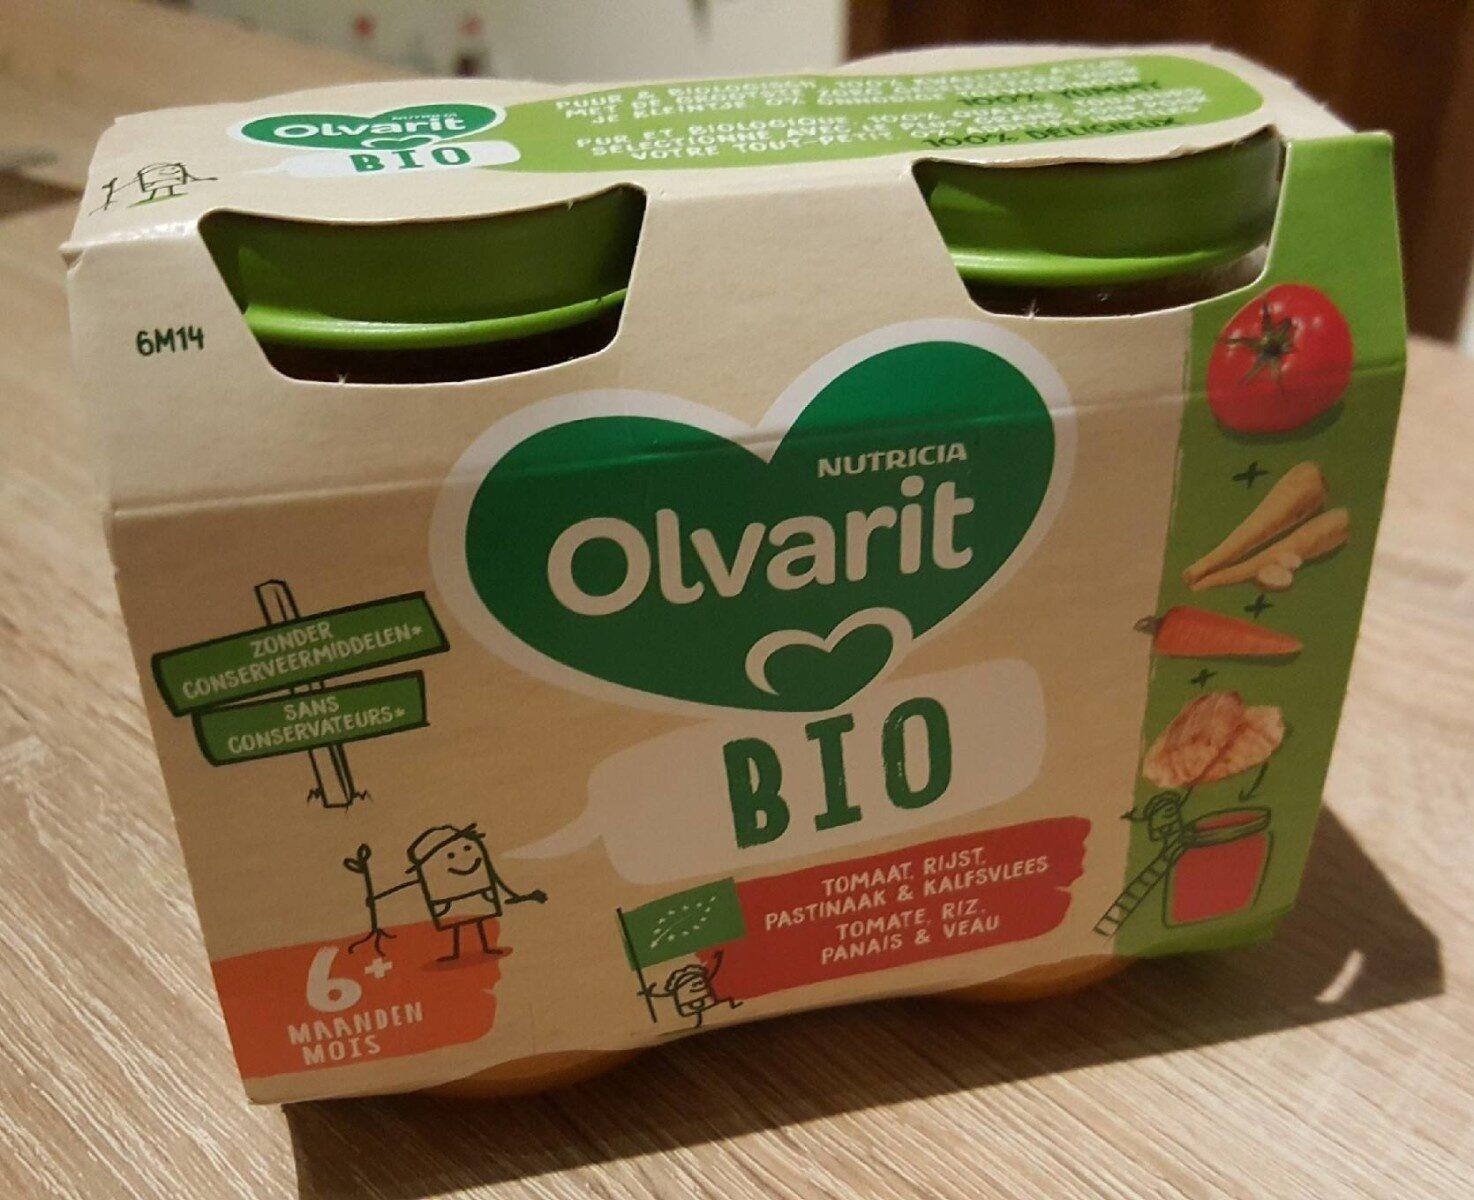 Olvarit Bio - Product